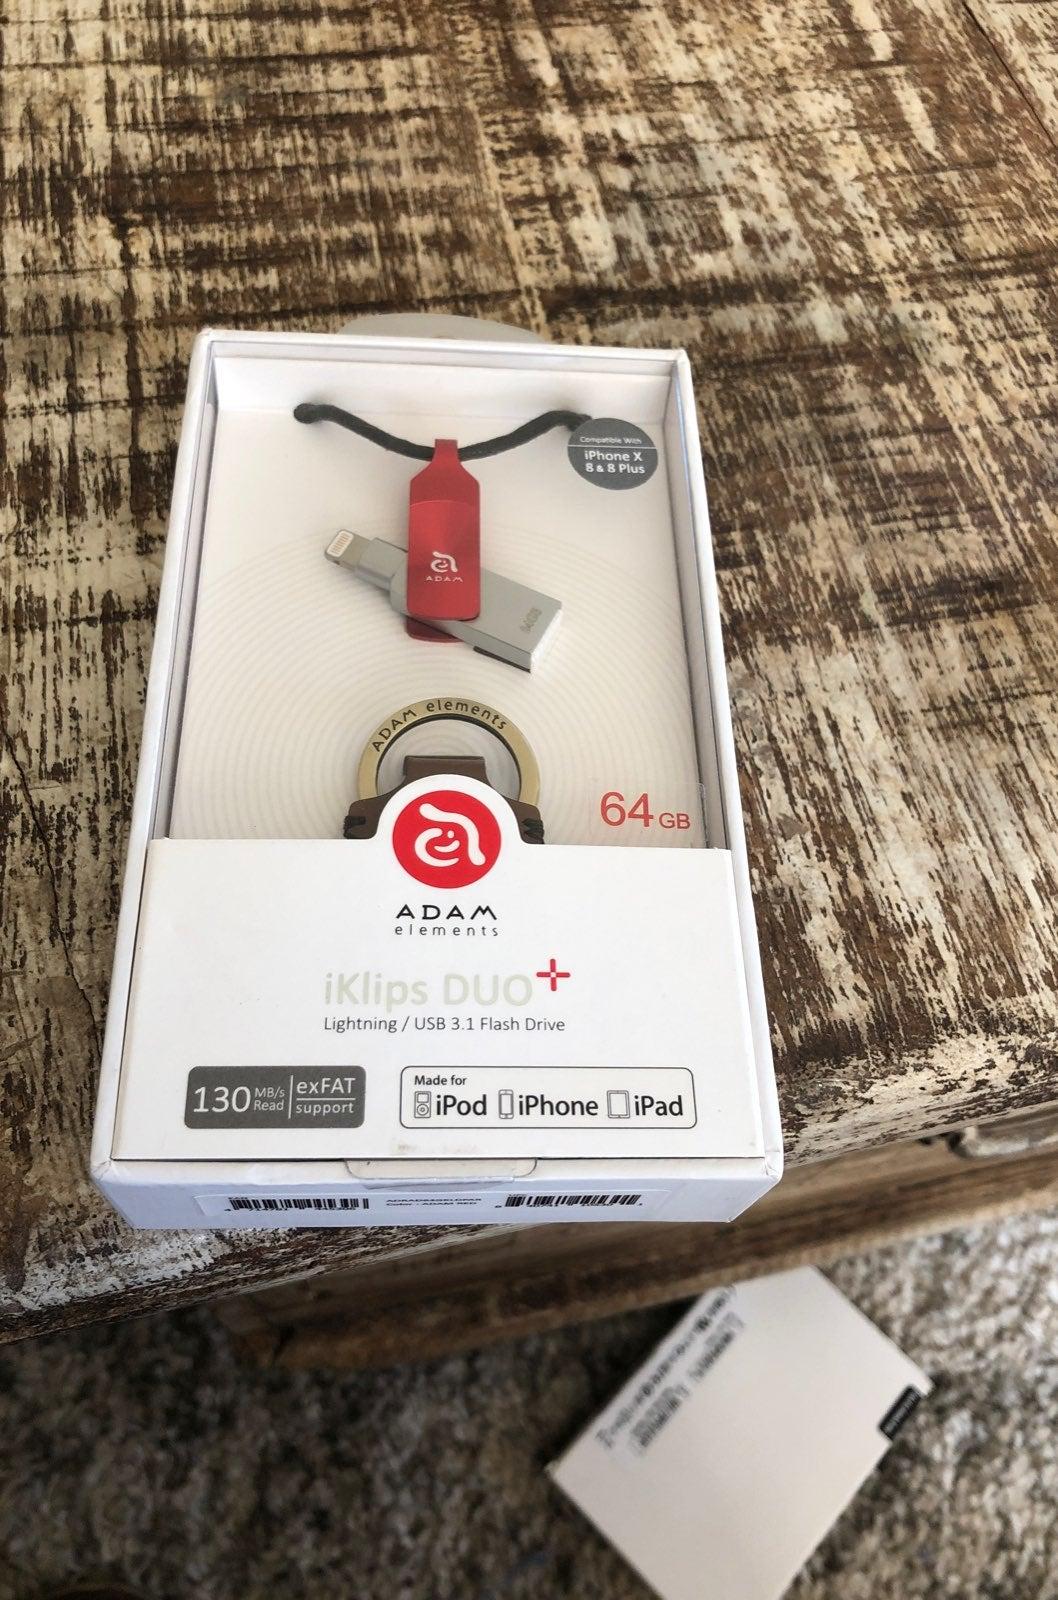 iKlips DUO+ 64G Red-Apple iPhone Lightni